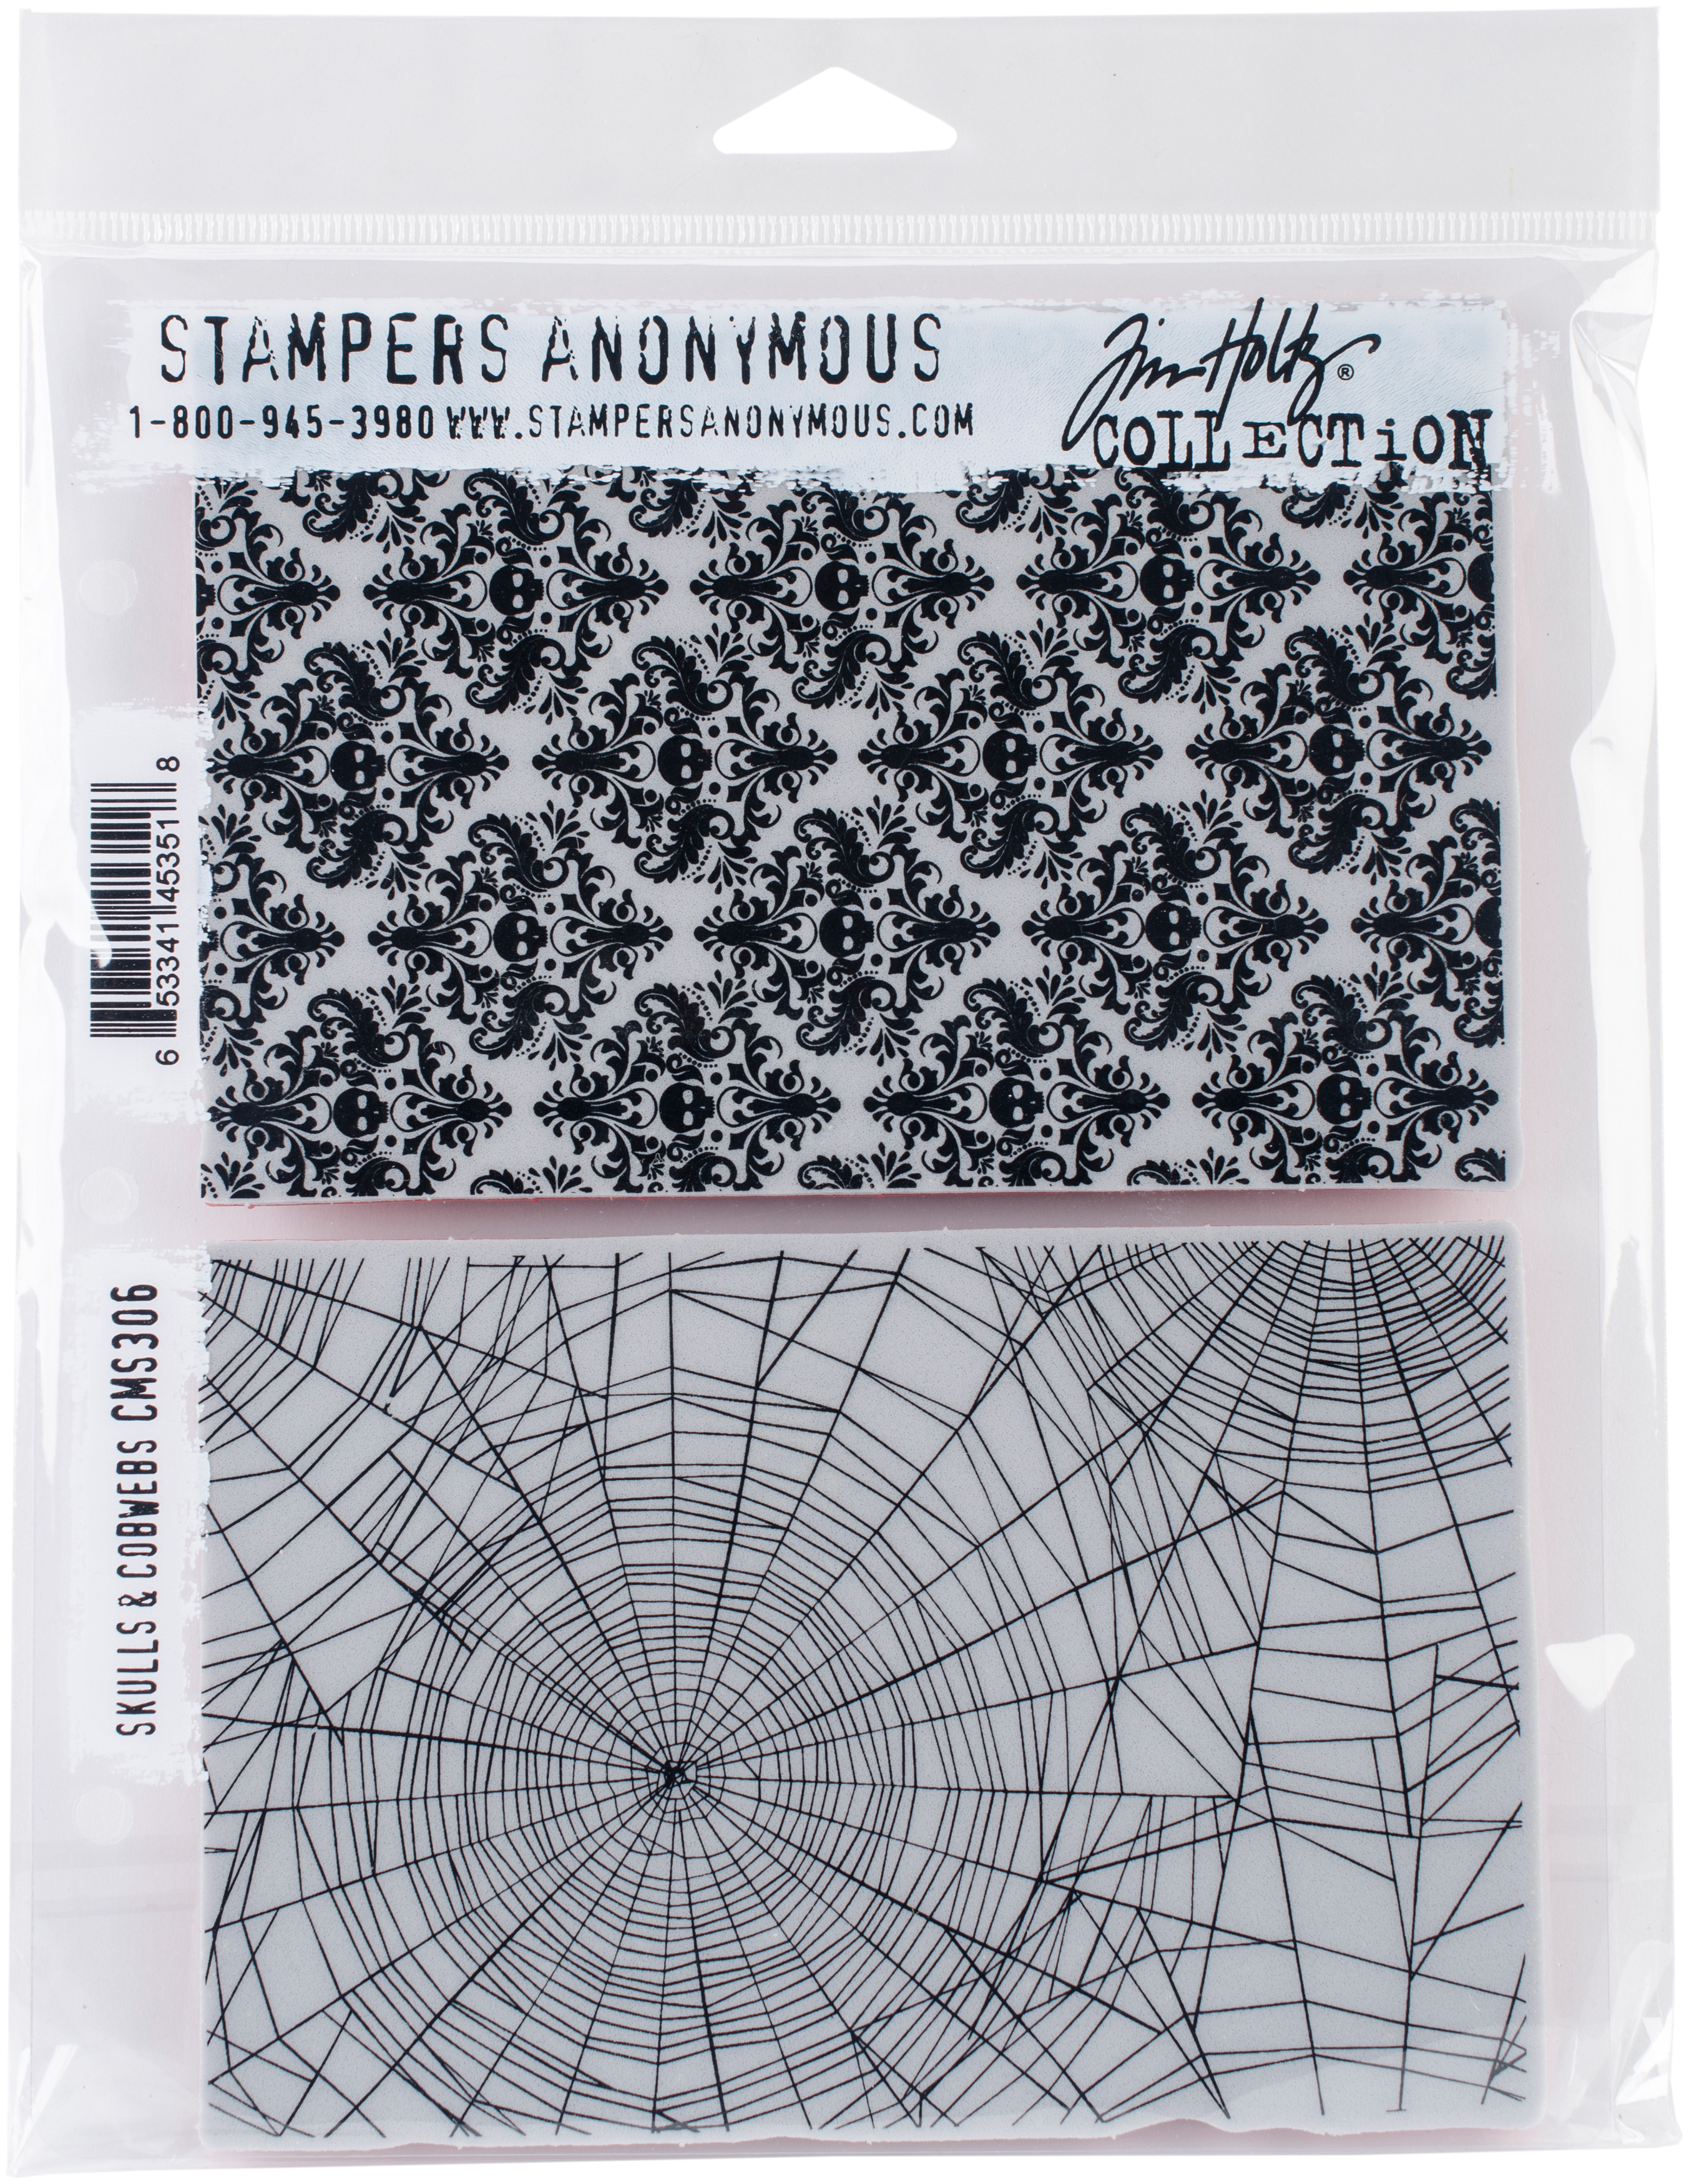 Tim Holtz Cling Stamps 7X8.5-Skulls & Cobwebs